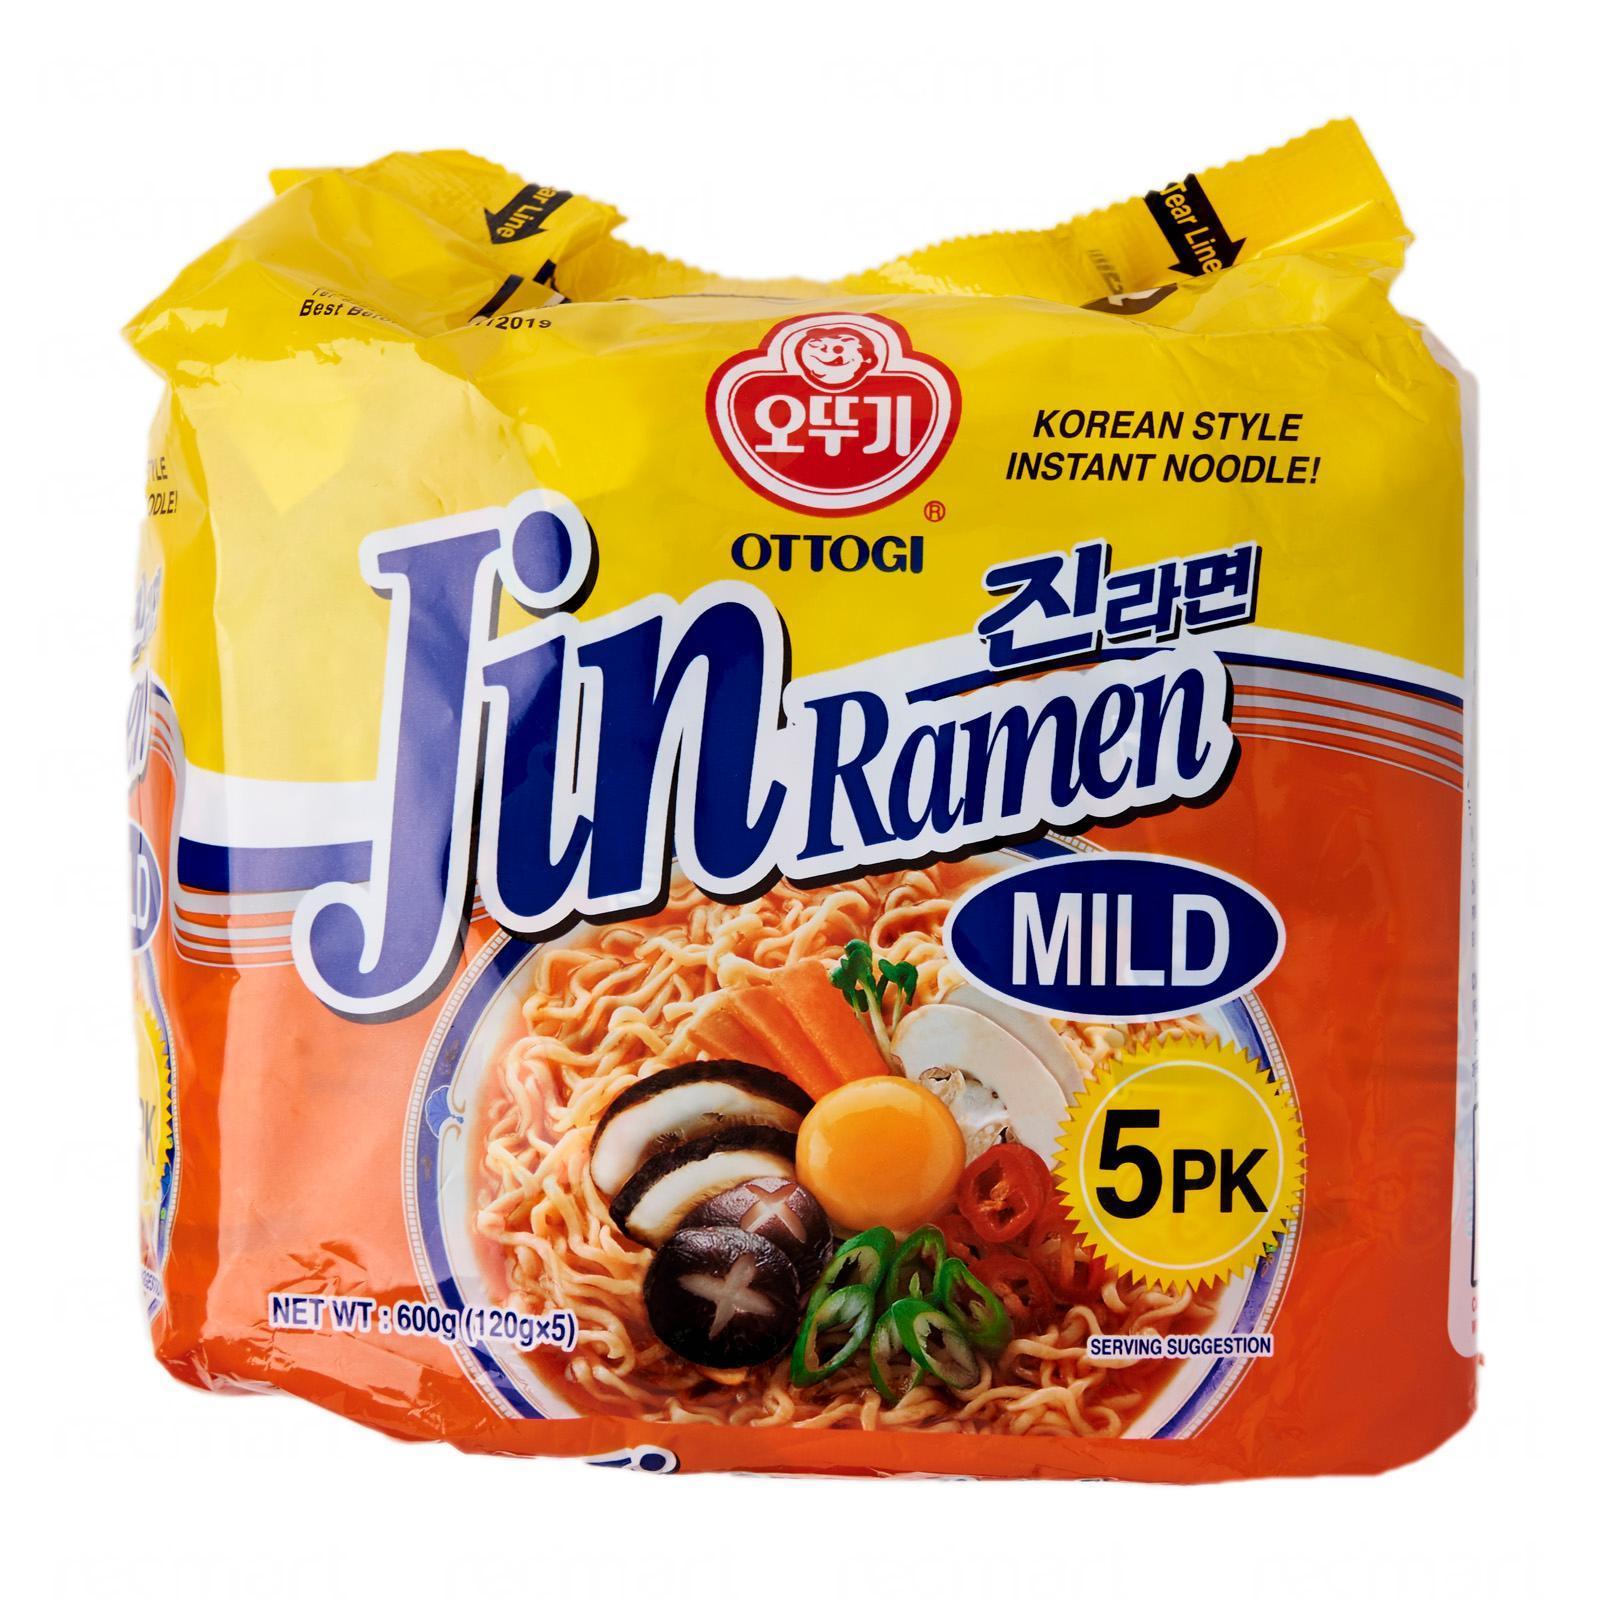 Ottogi Jin Ramen Mild Instant Noodle